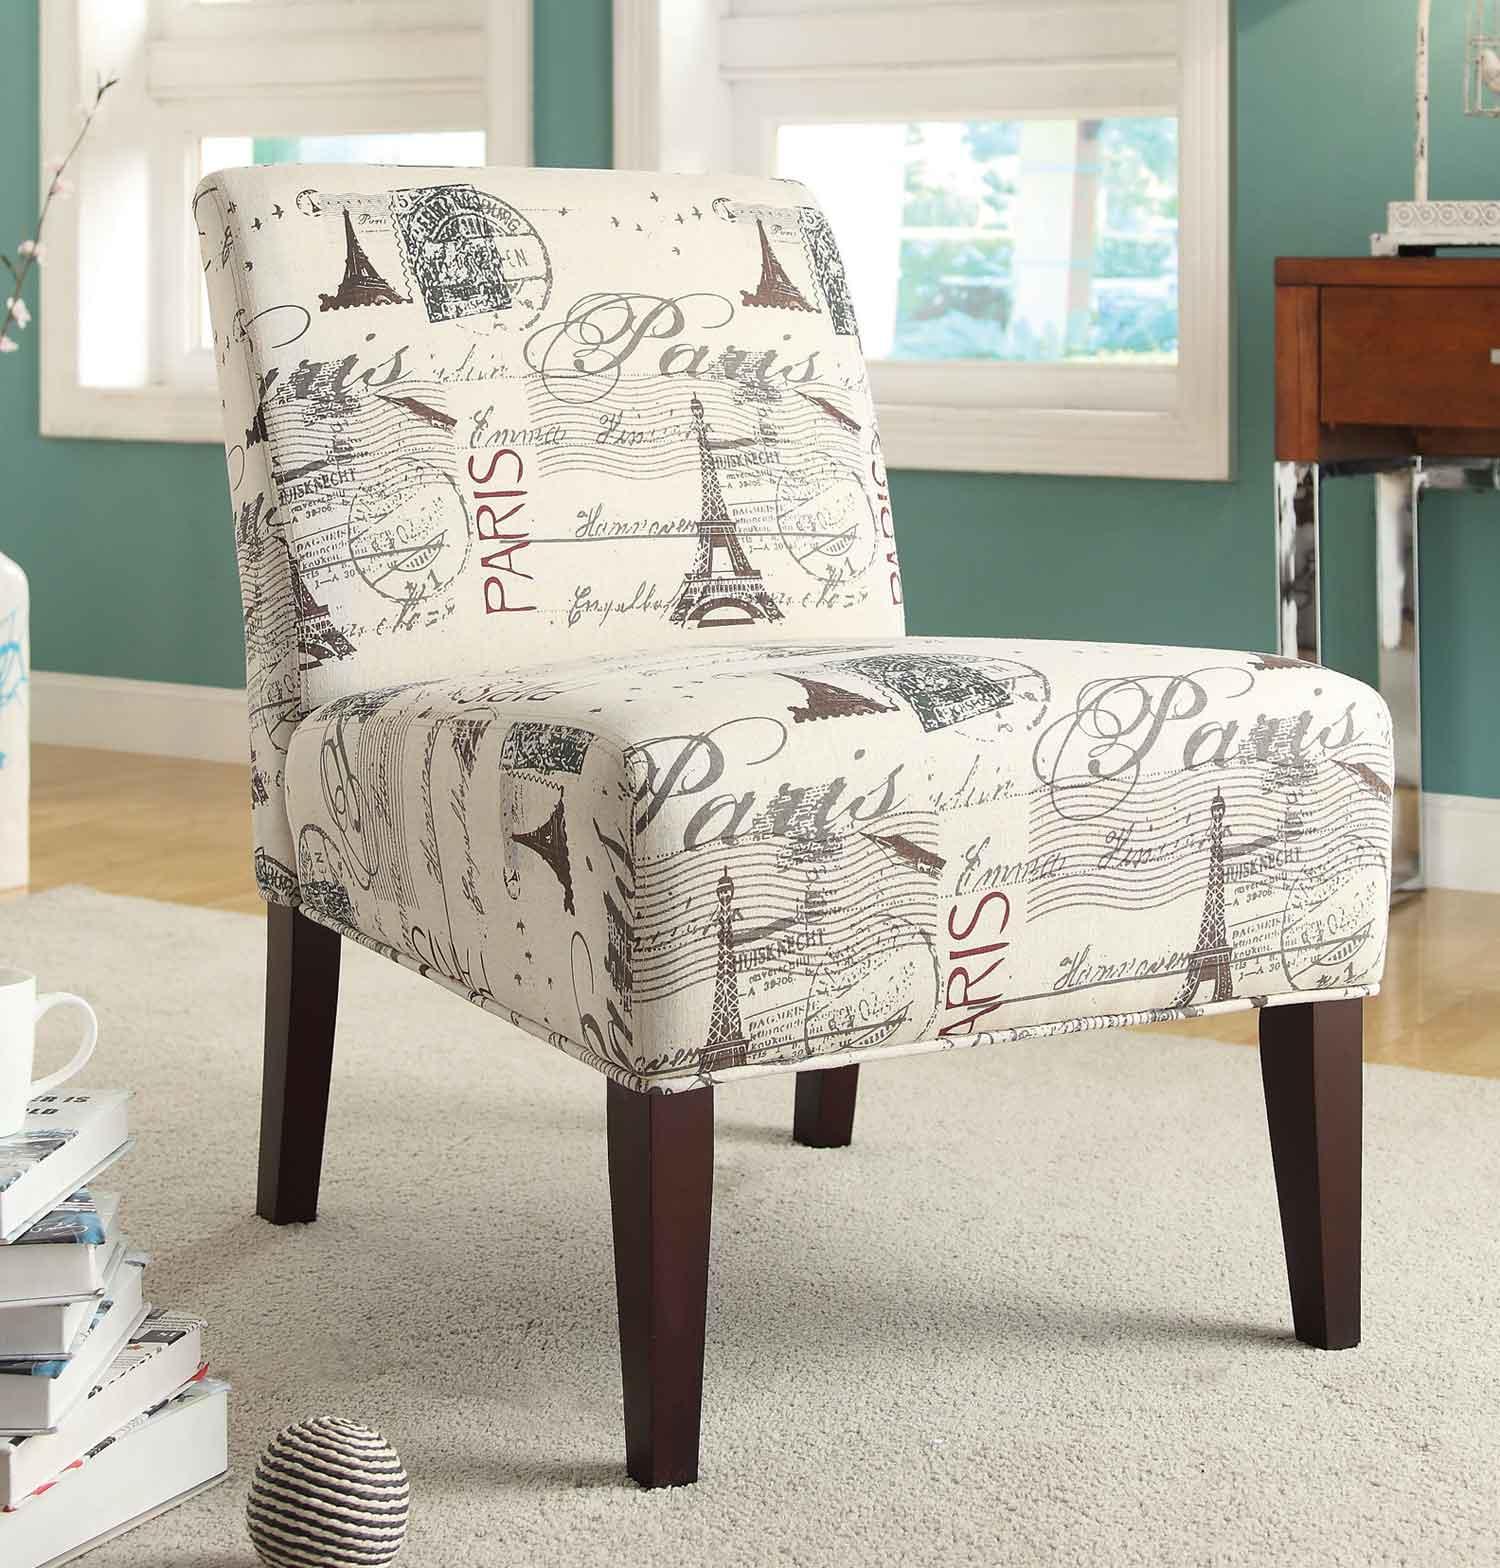 Coaster 902192 Accent Chair - Beige/Charcoal Postcard Design